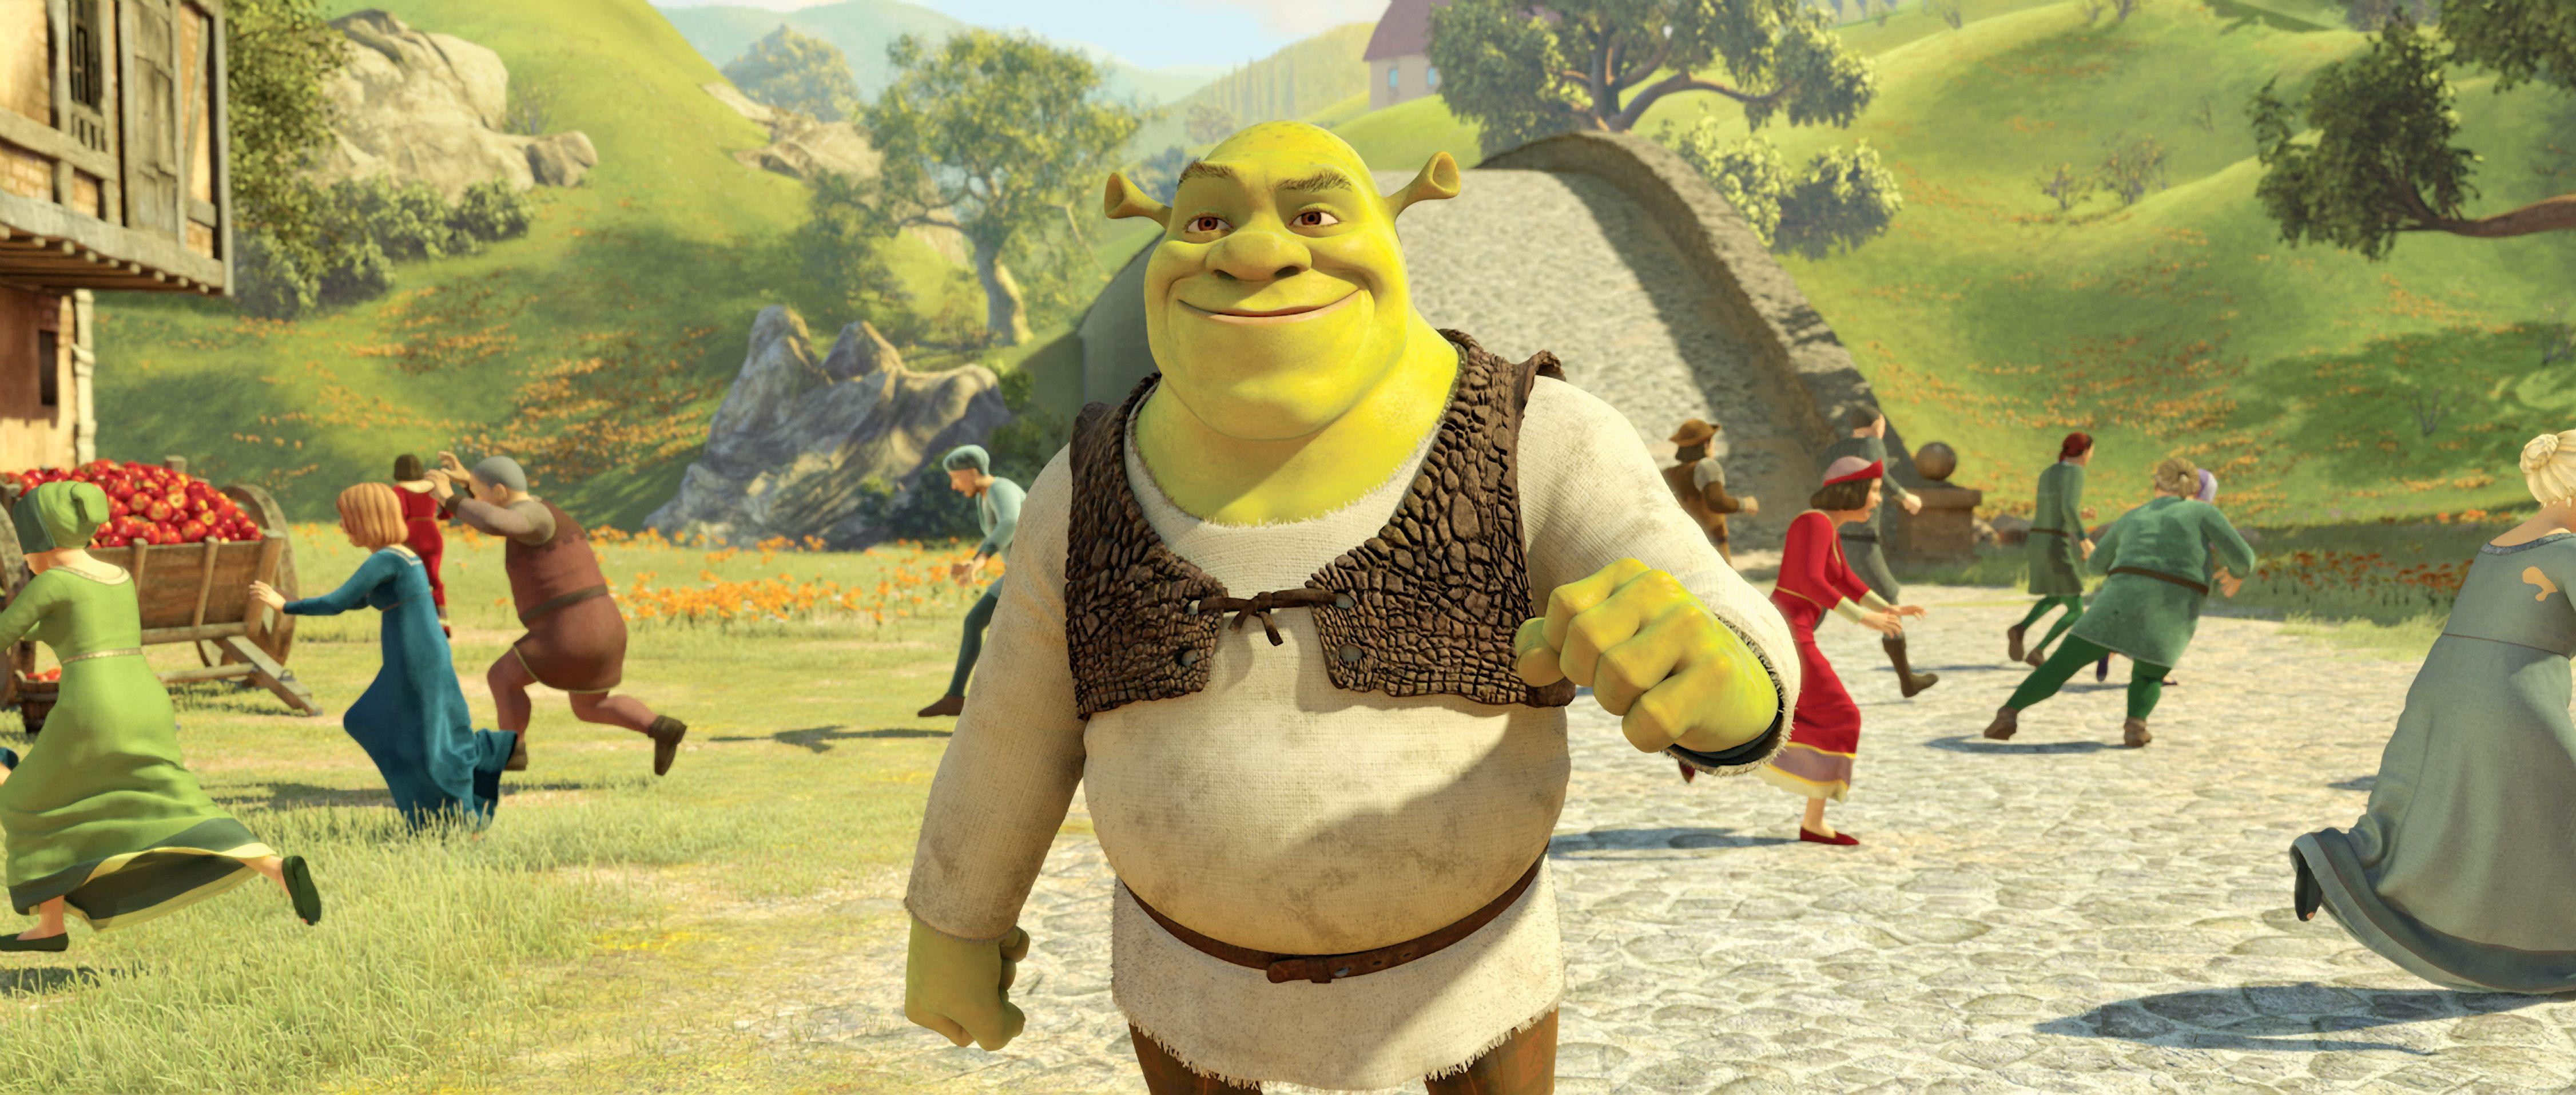 Donkey Shrek The Final Chapter HD Desktop Wallpaper Widescreen